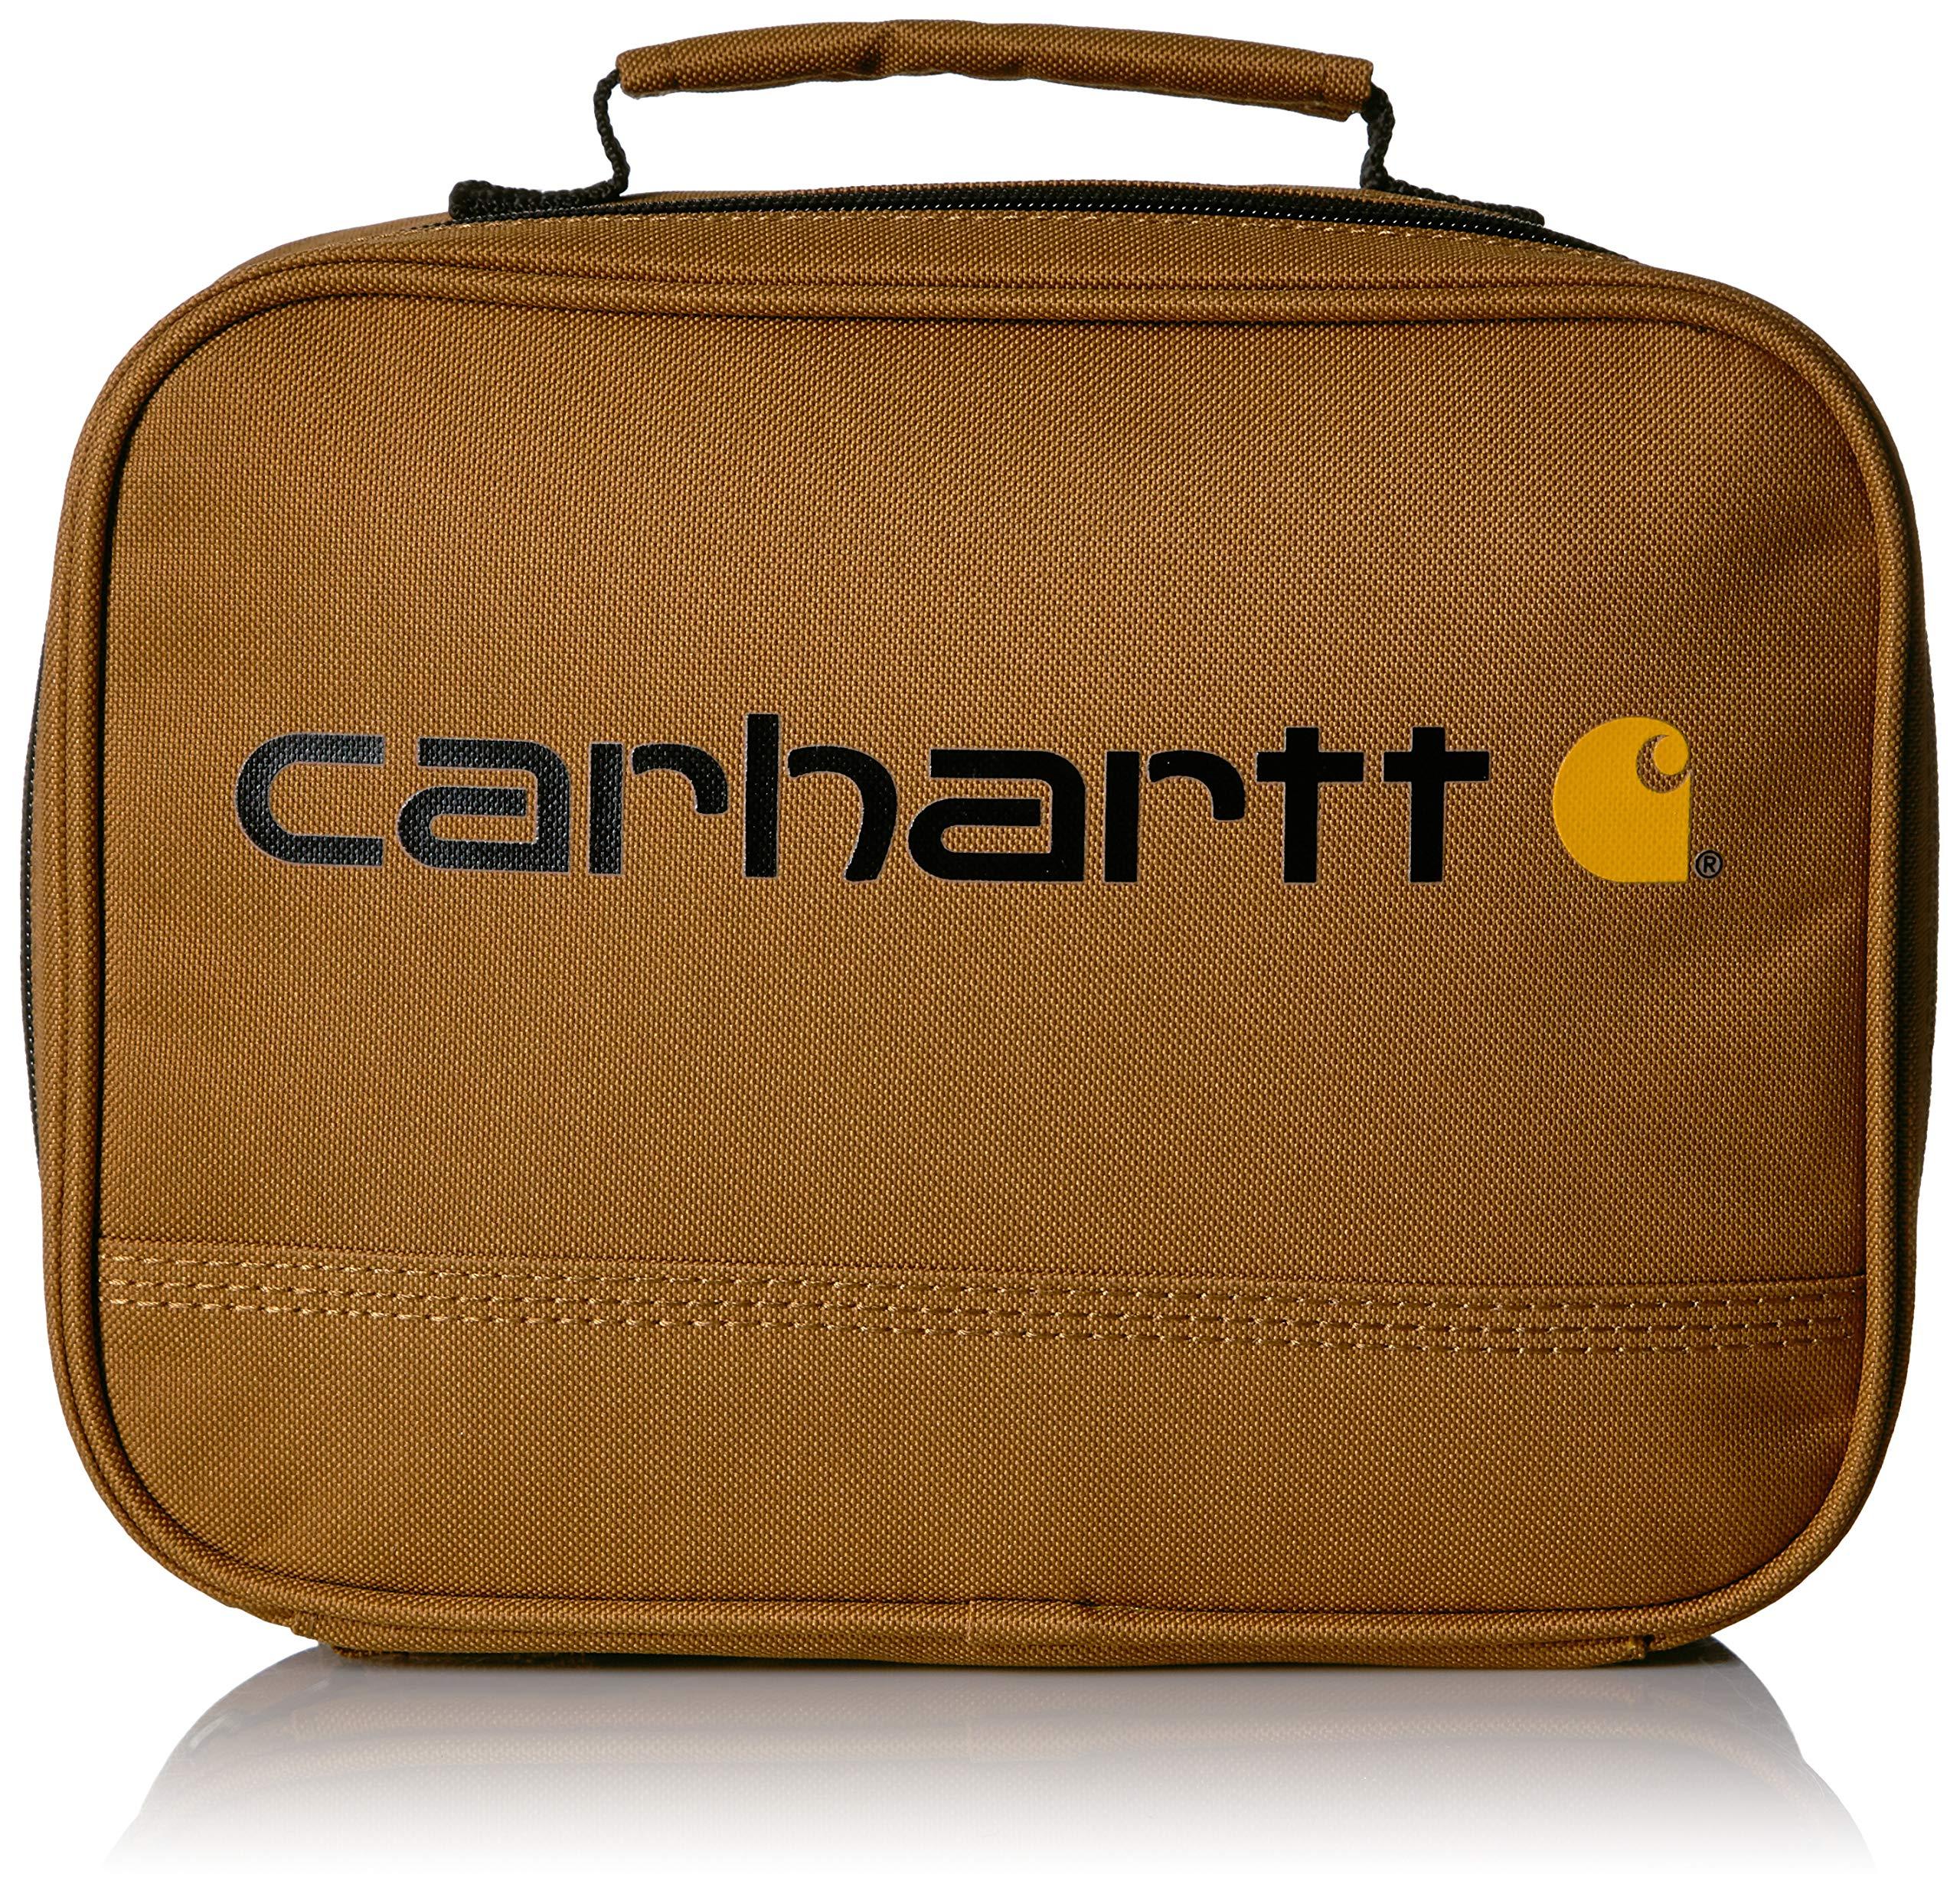 Carhartt Insulated Soft-Sided Lunchbox, Carhartt Brown